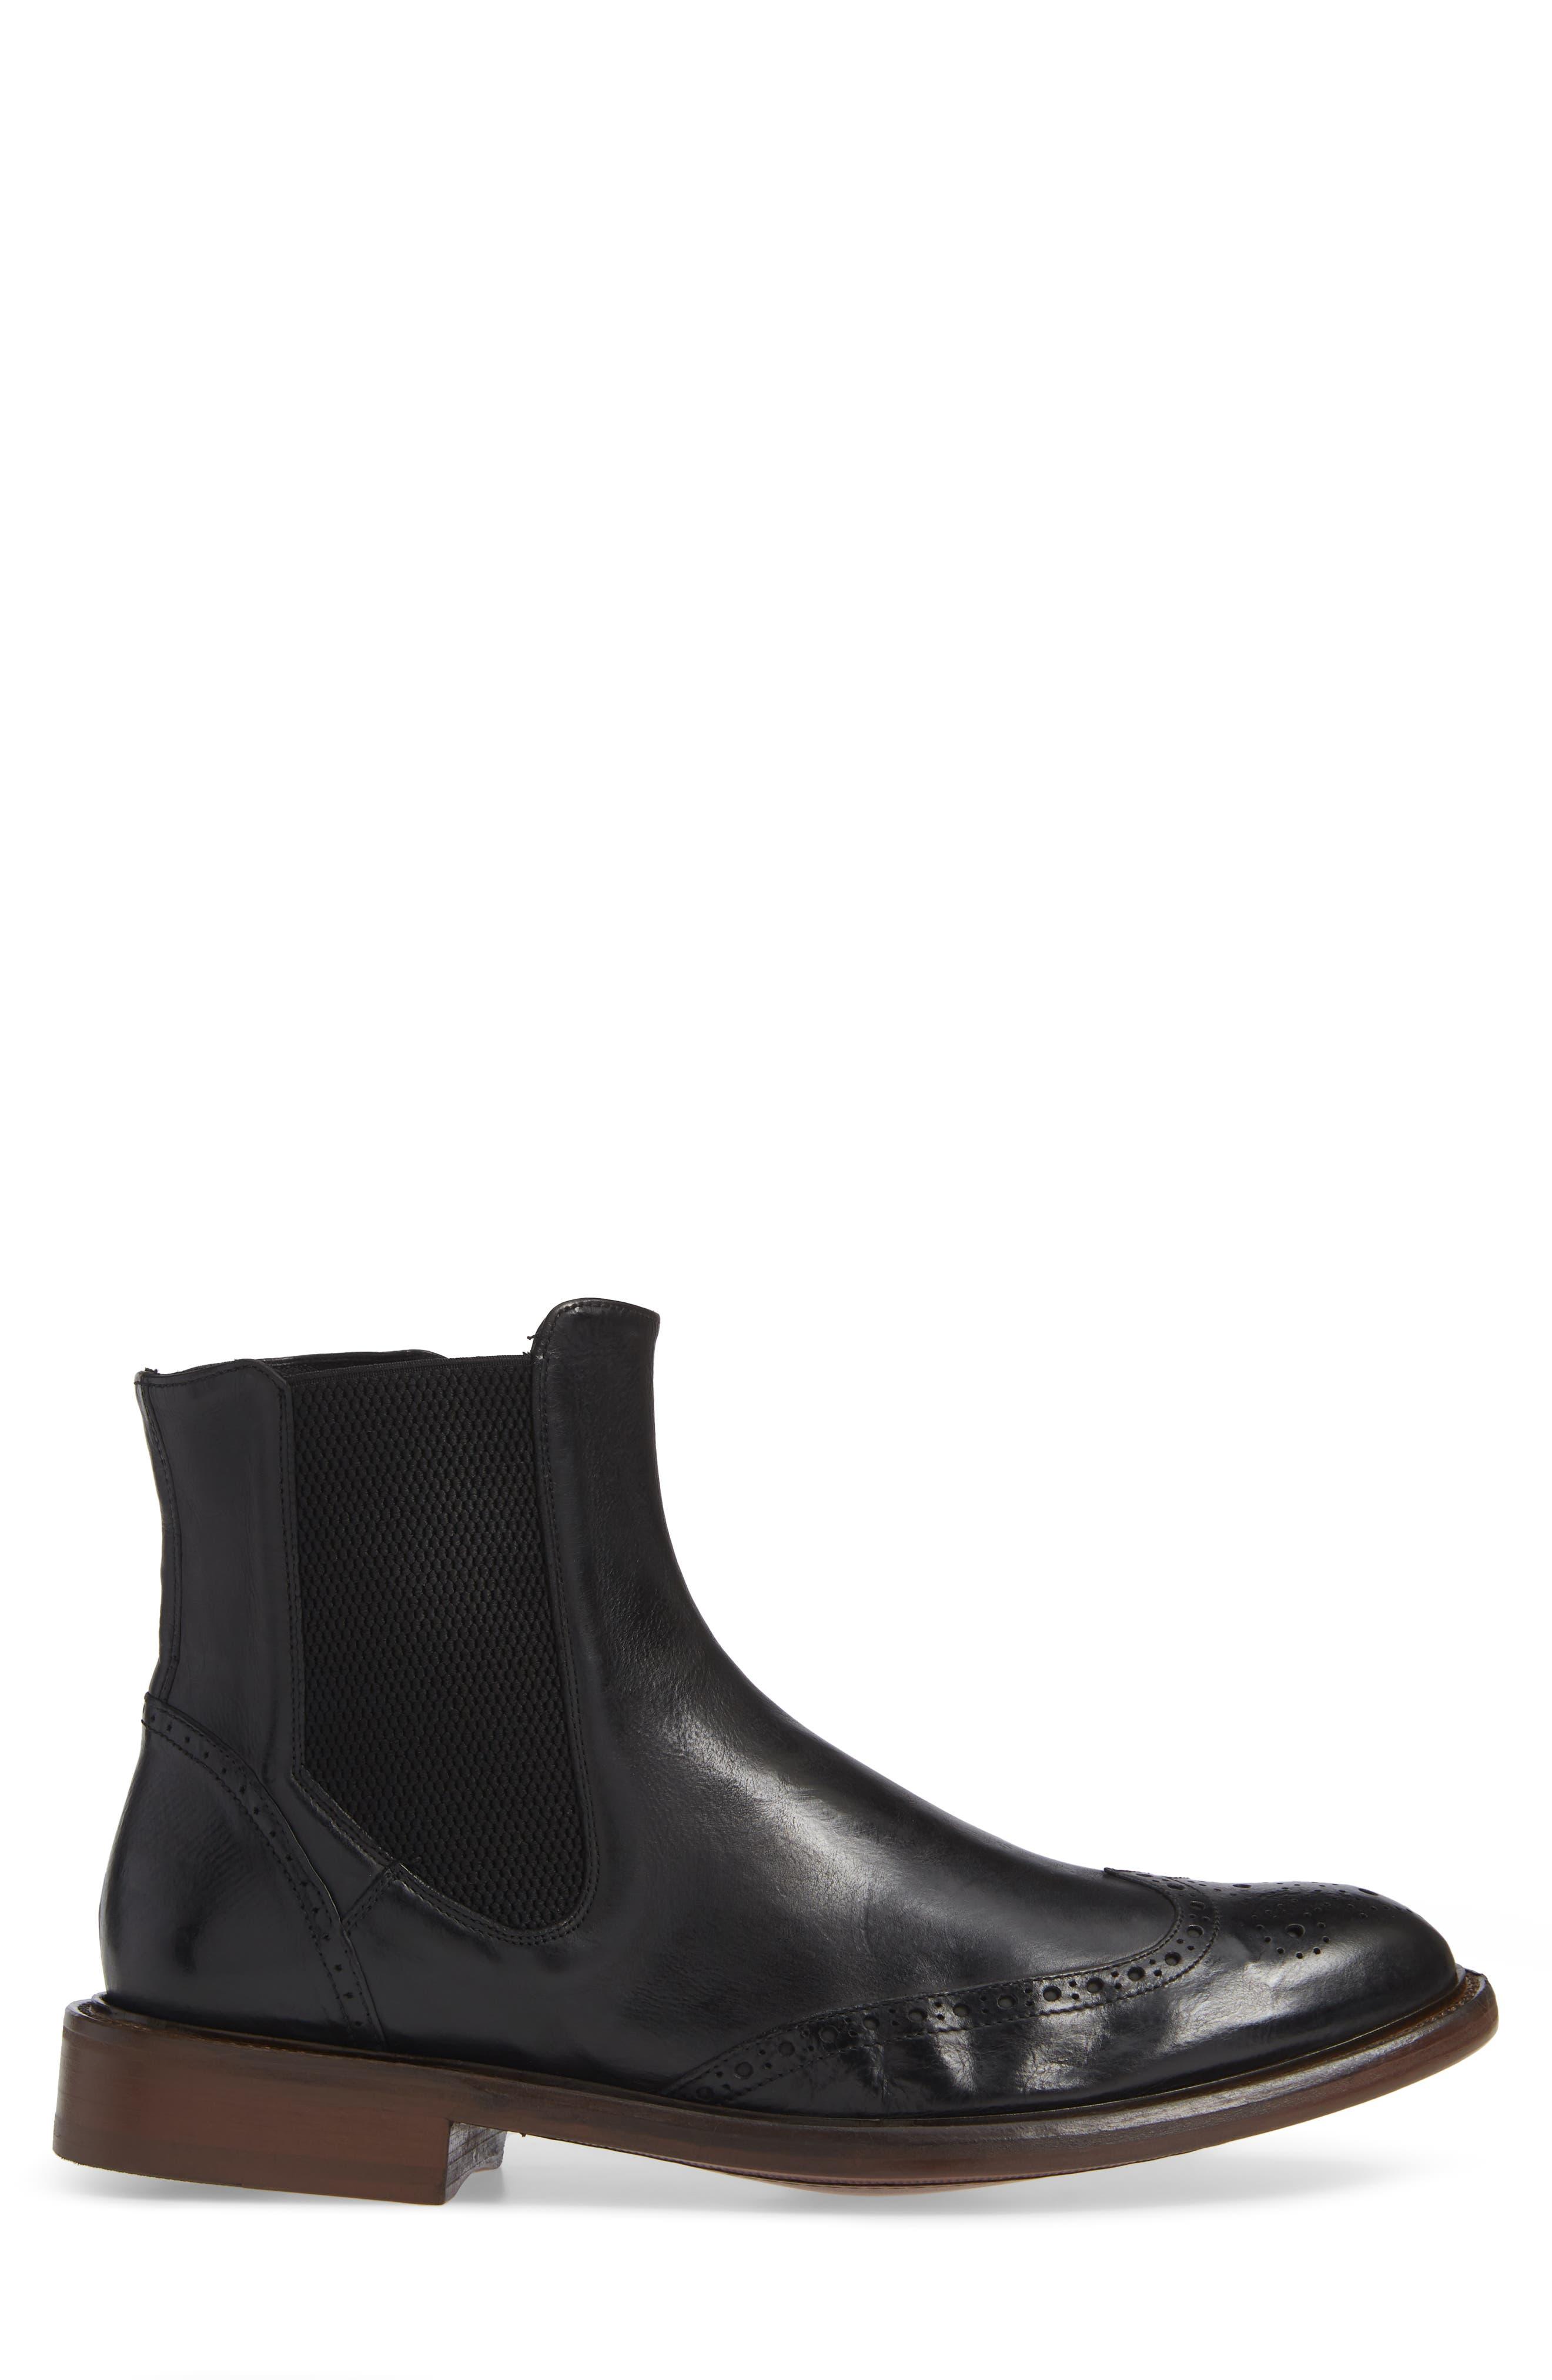 Bryson Wingtip Chelsea Boot,                             Alternate thumbnail 3, color,                             BLACK LEATHER